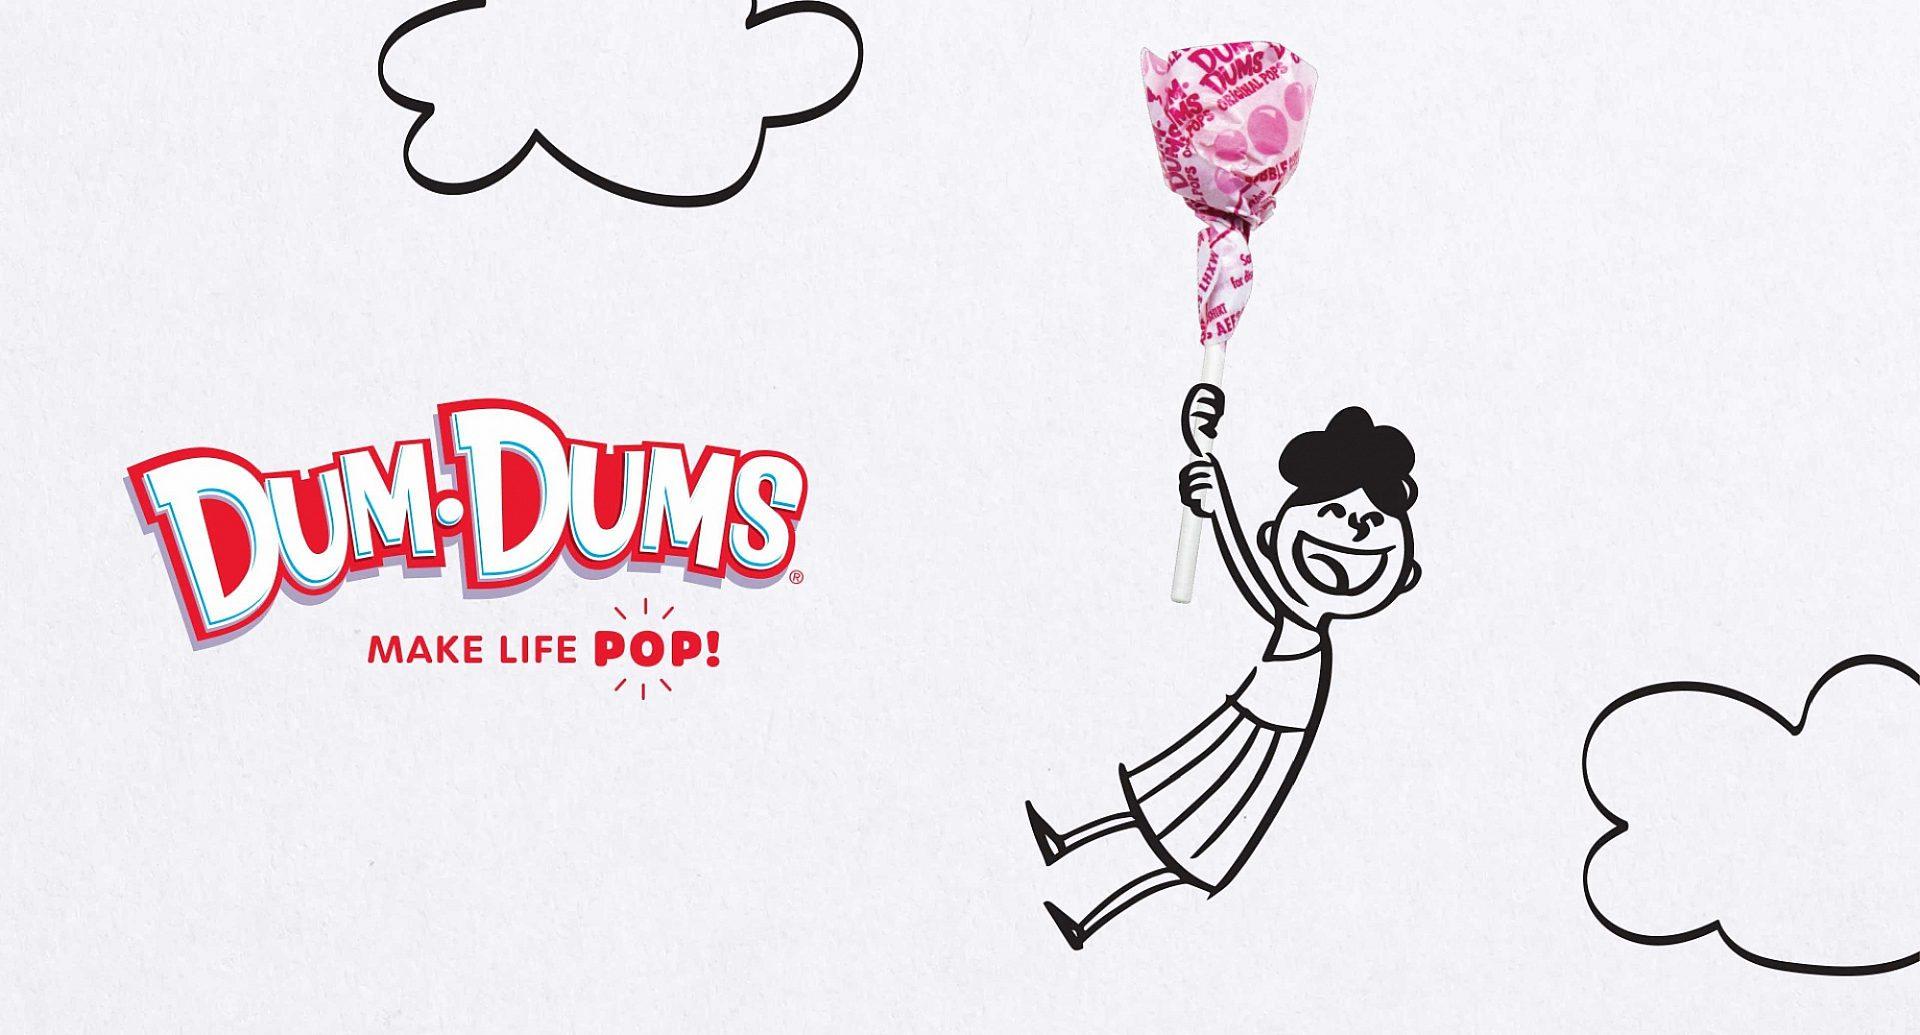 Dum-Dums - Make Life Pop! Campaign.